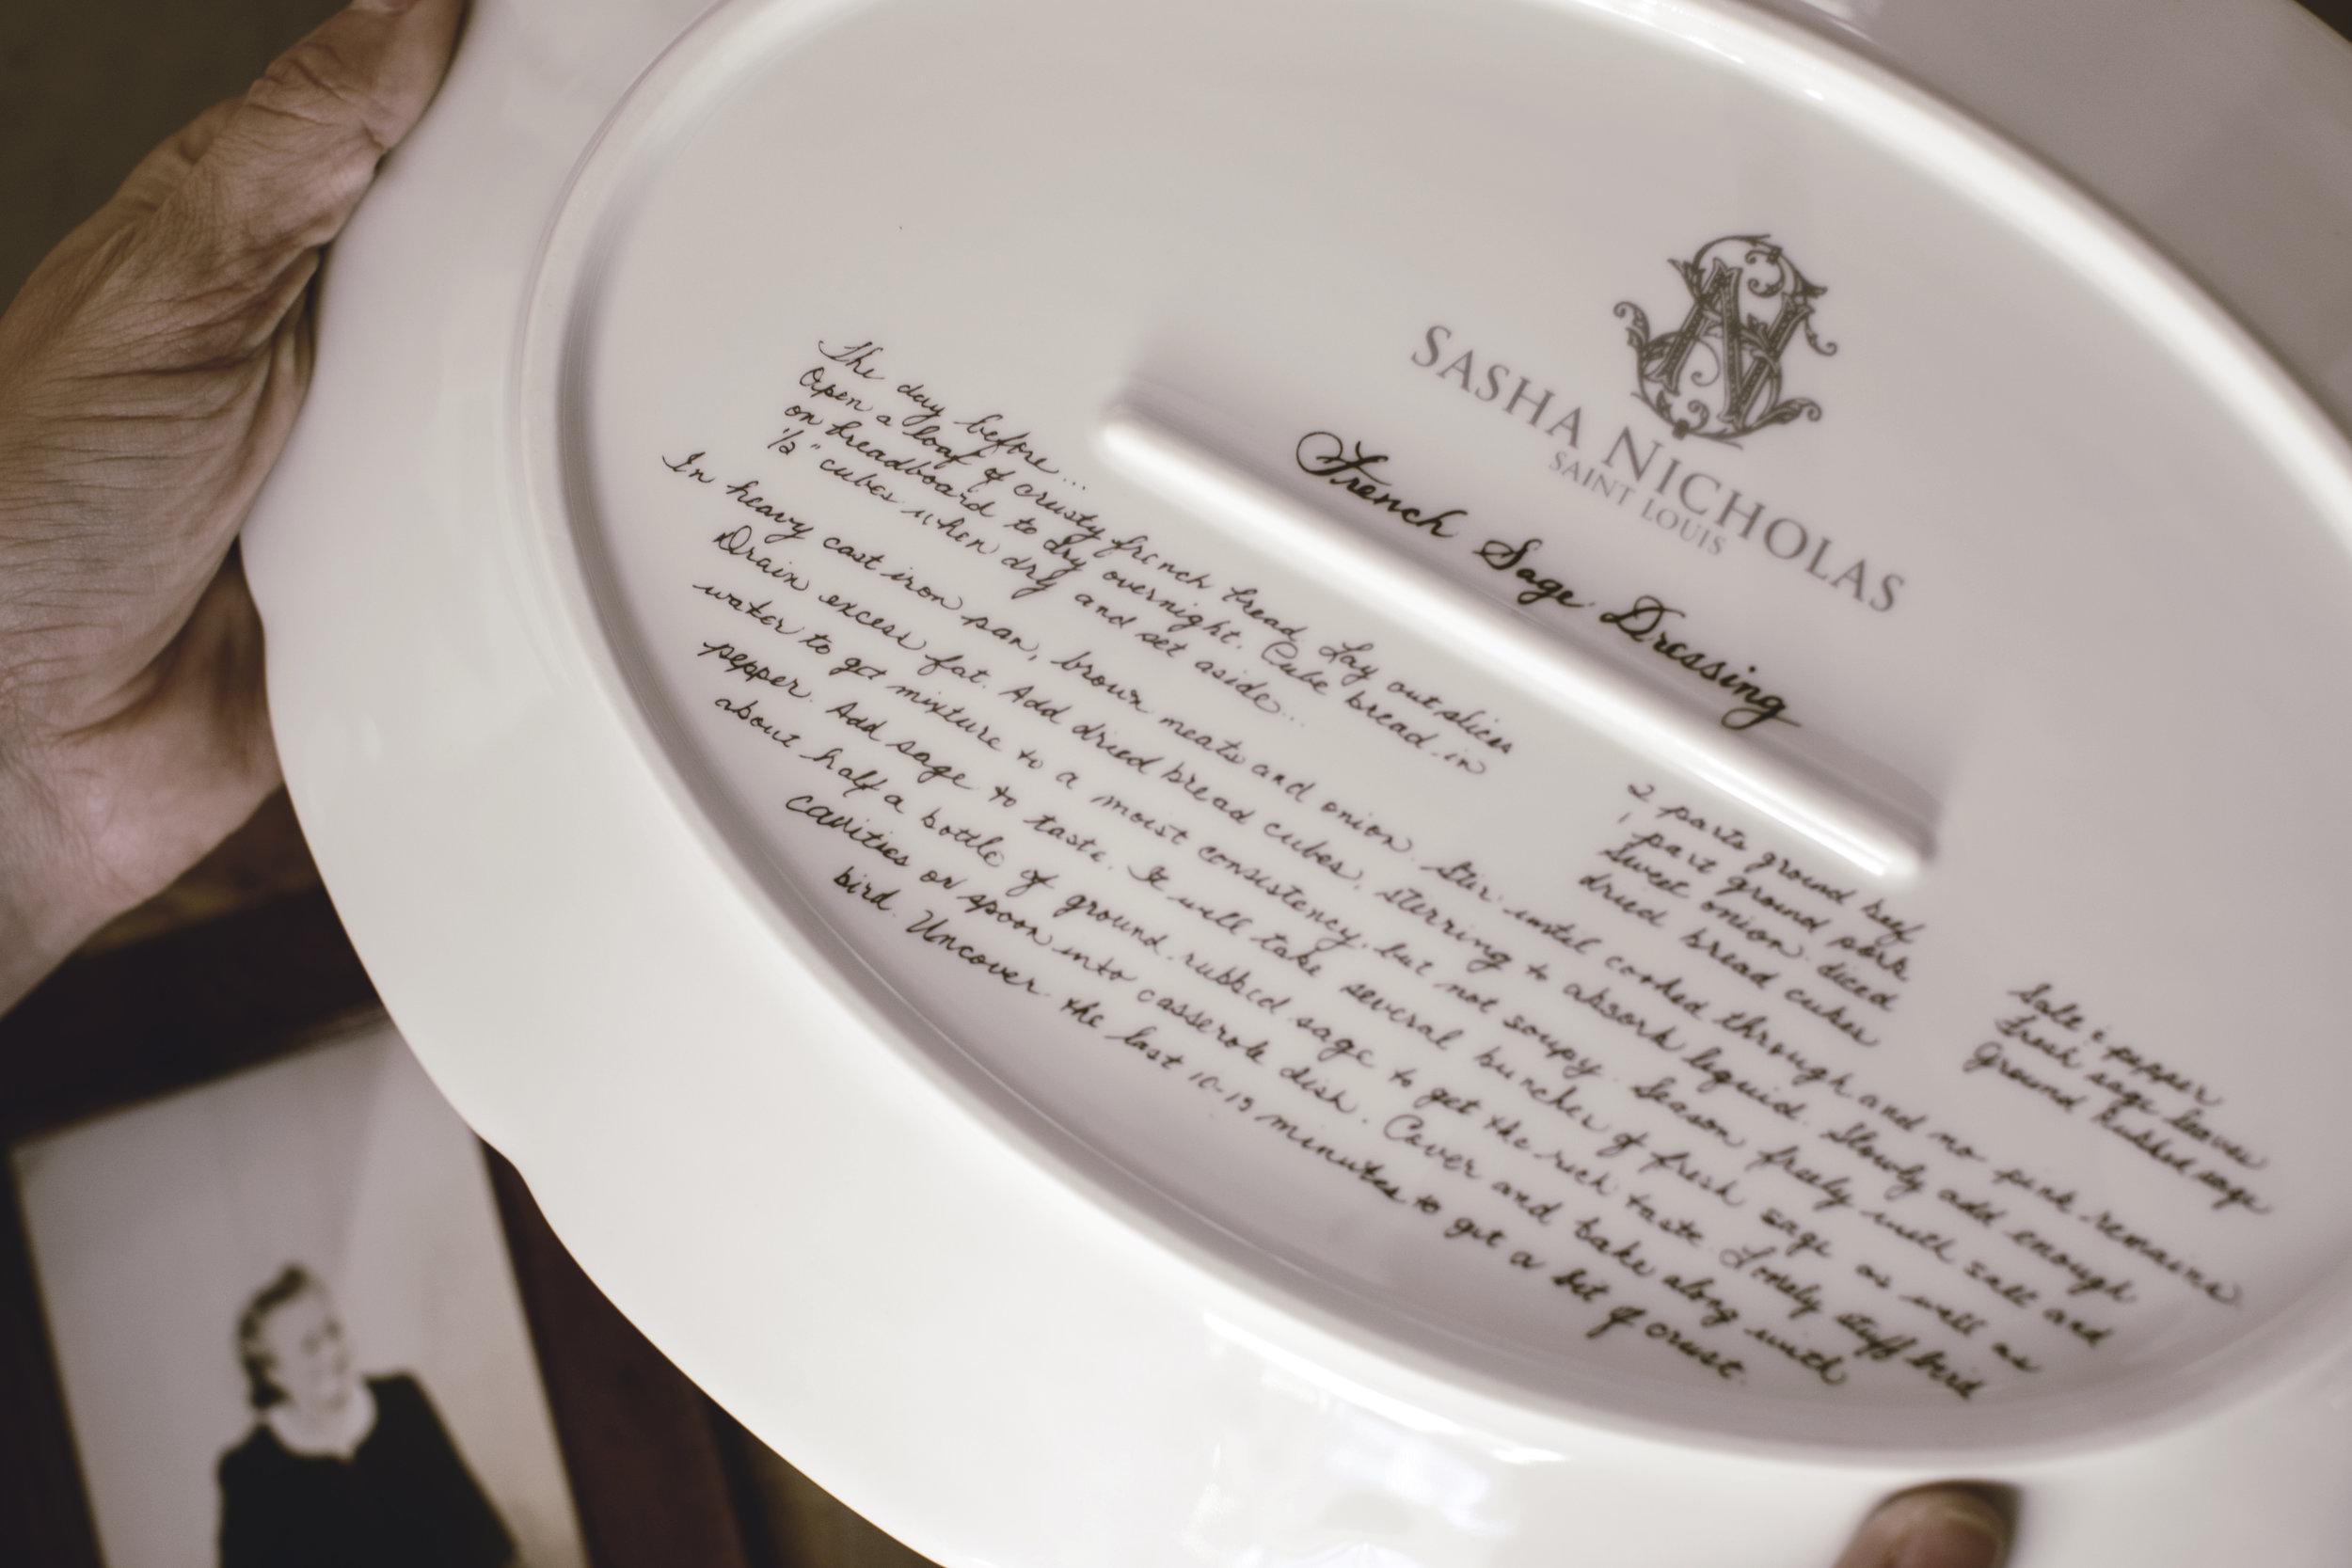 handwritten recipe printed on oval platter from Sasha Nicholas